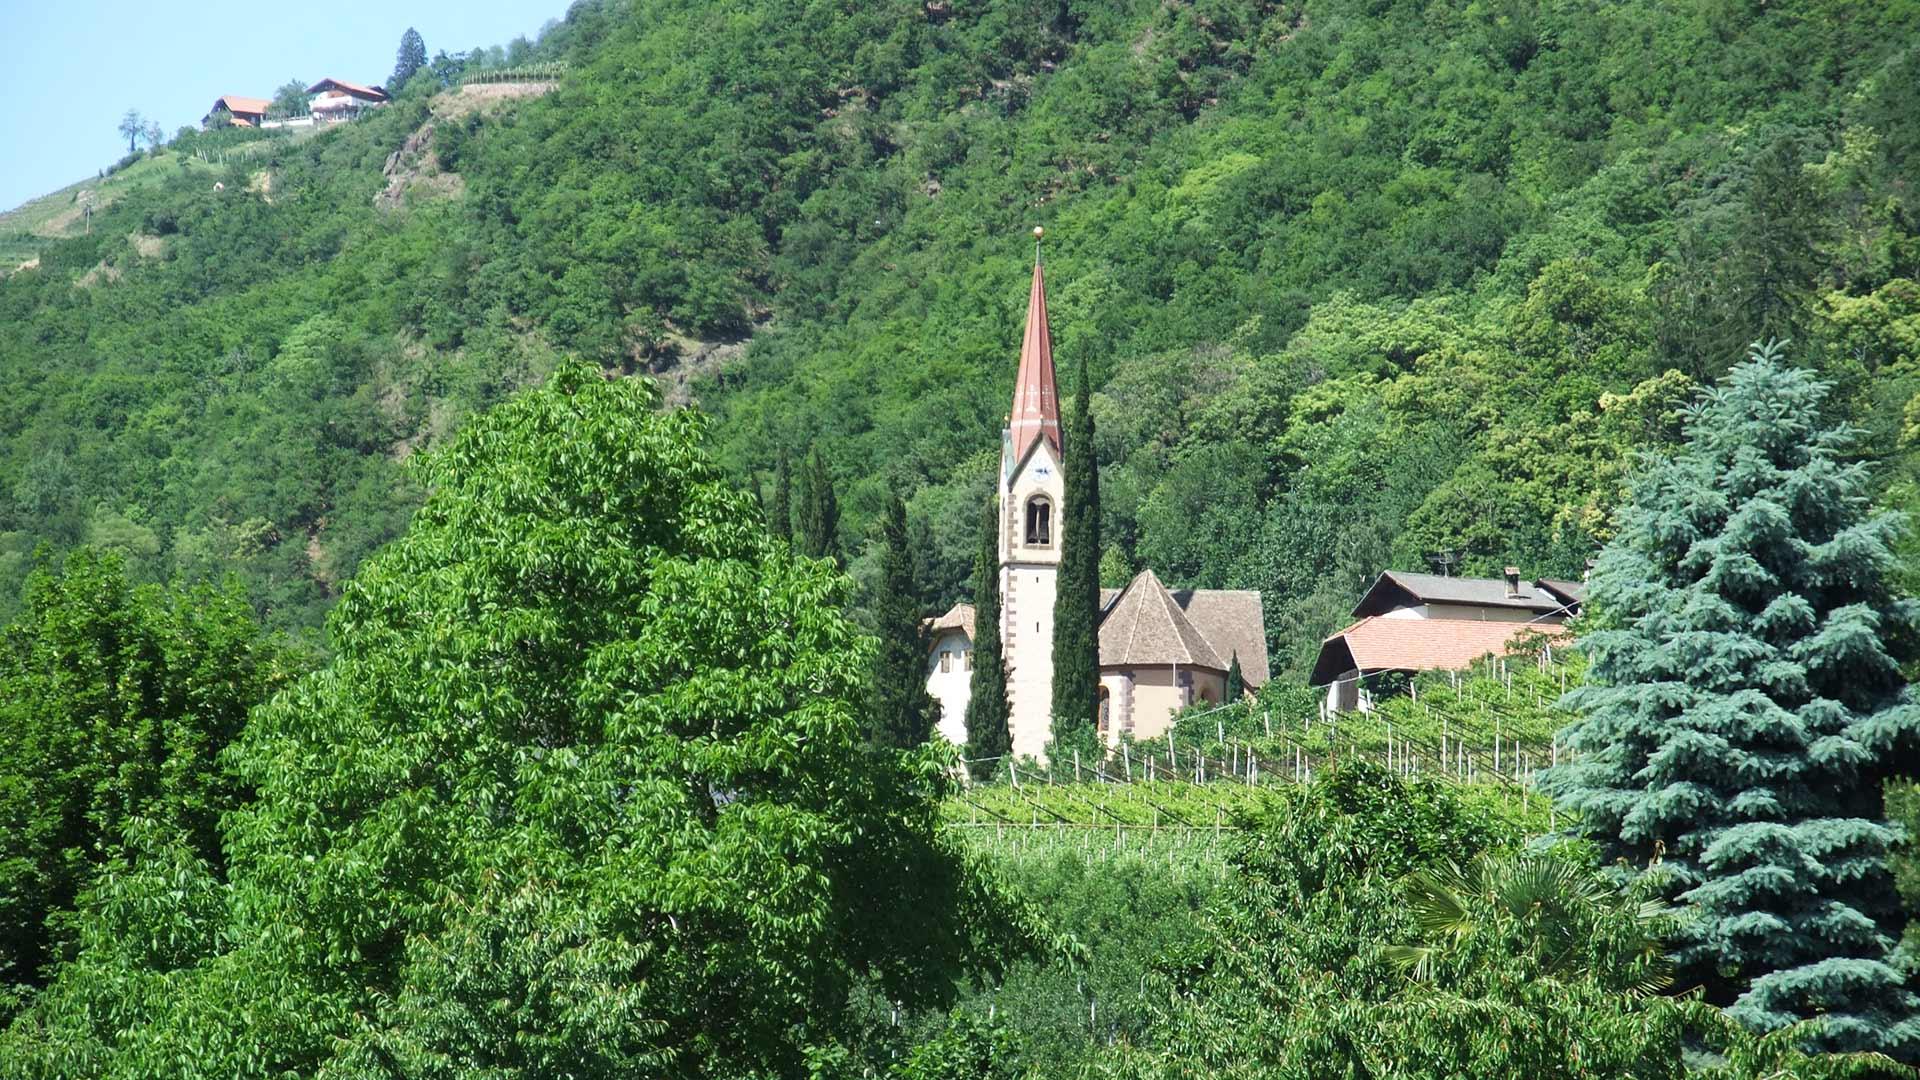 Burgstall bei Meran - Kirche